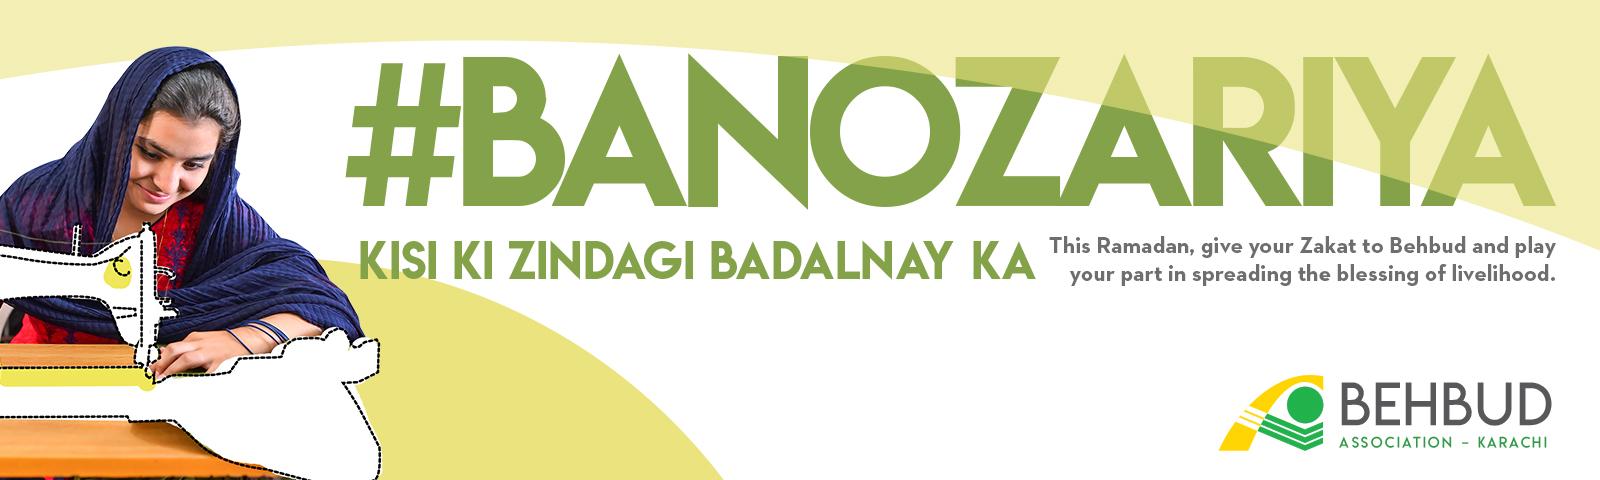 banozariya-ramadan-banner2